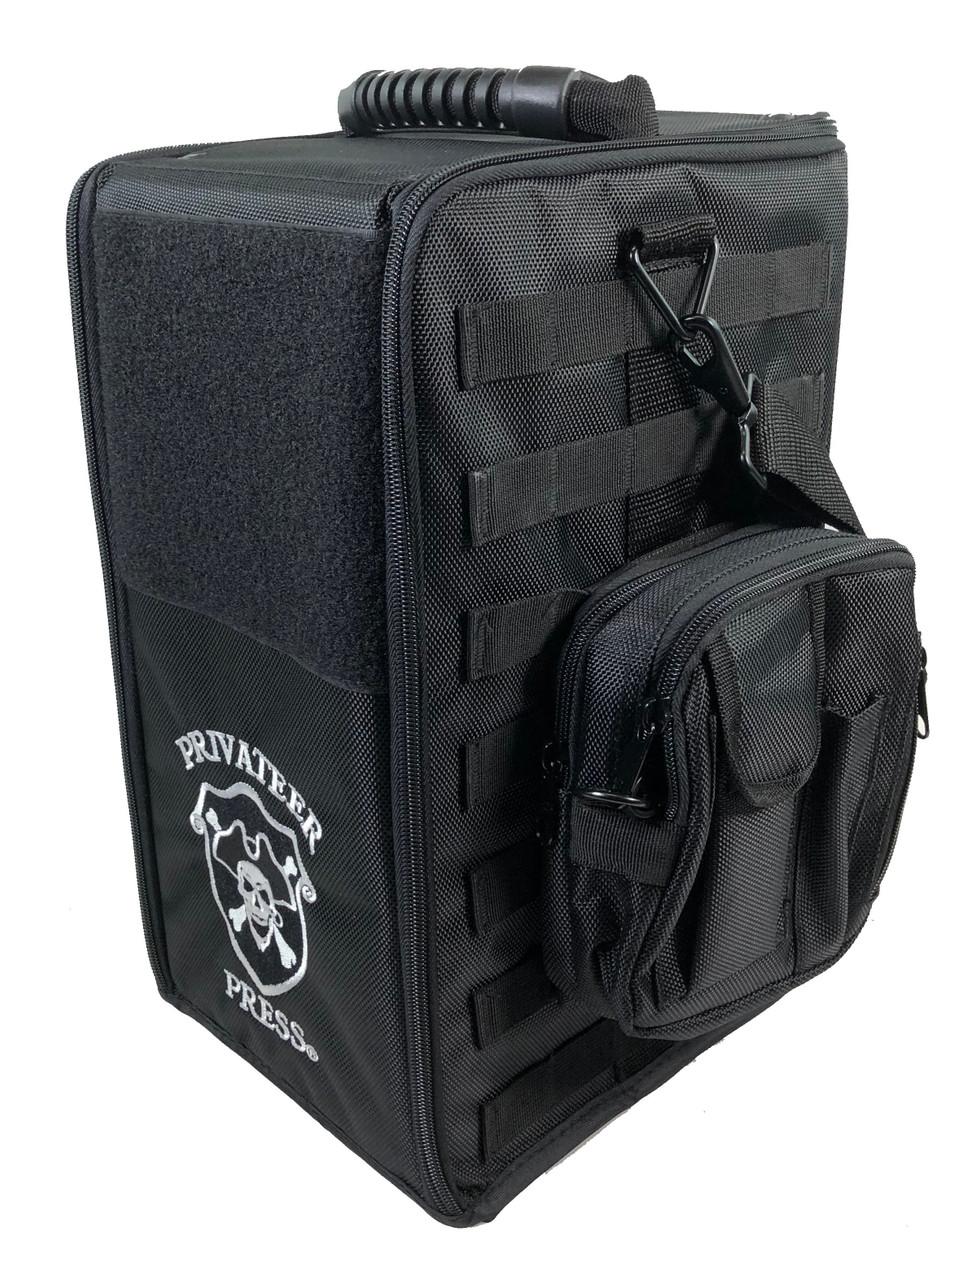 Privateer Press Tournament Bag Standard Load Out Black Battle Foam Their big bag costs well over $250. privateer press tournament bag standard load out black